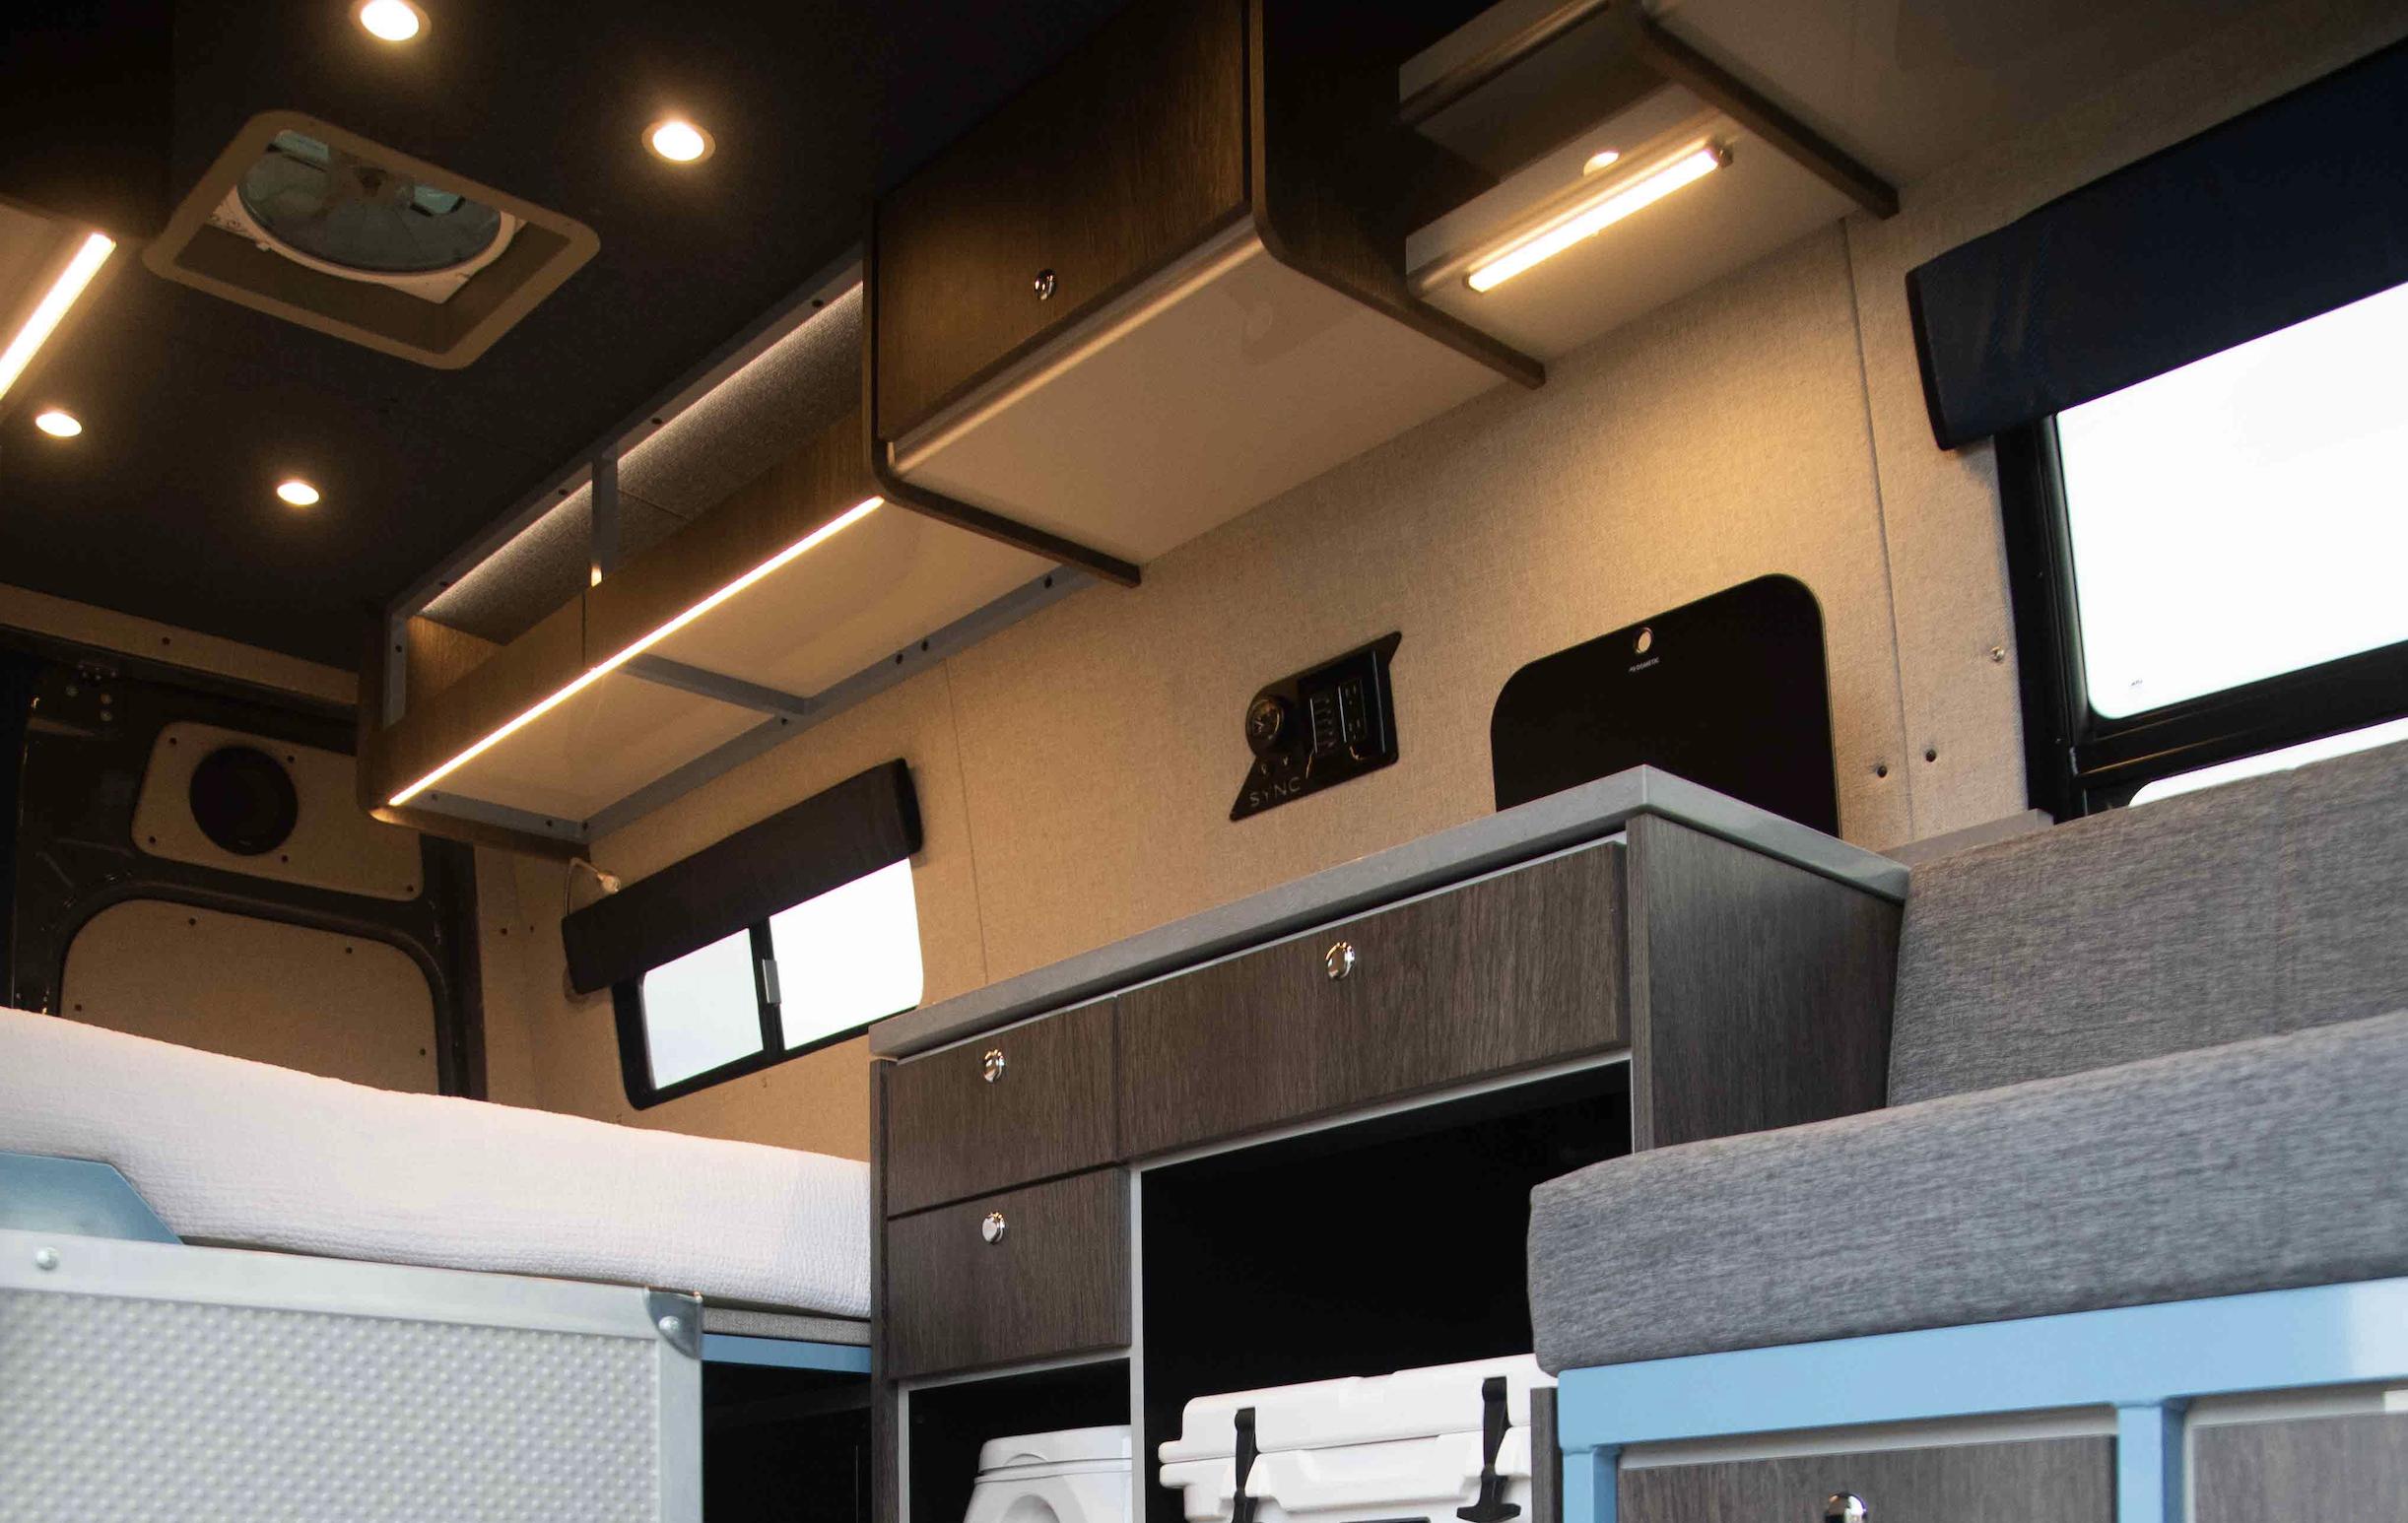 Benefits of Bi-Color Lighting for Your Van or RV